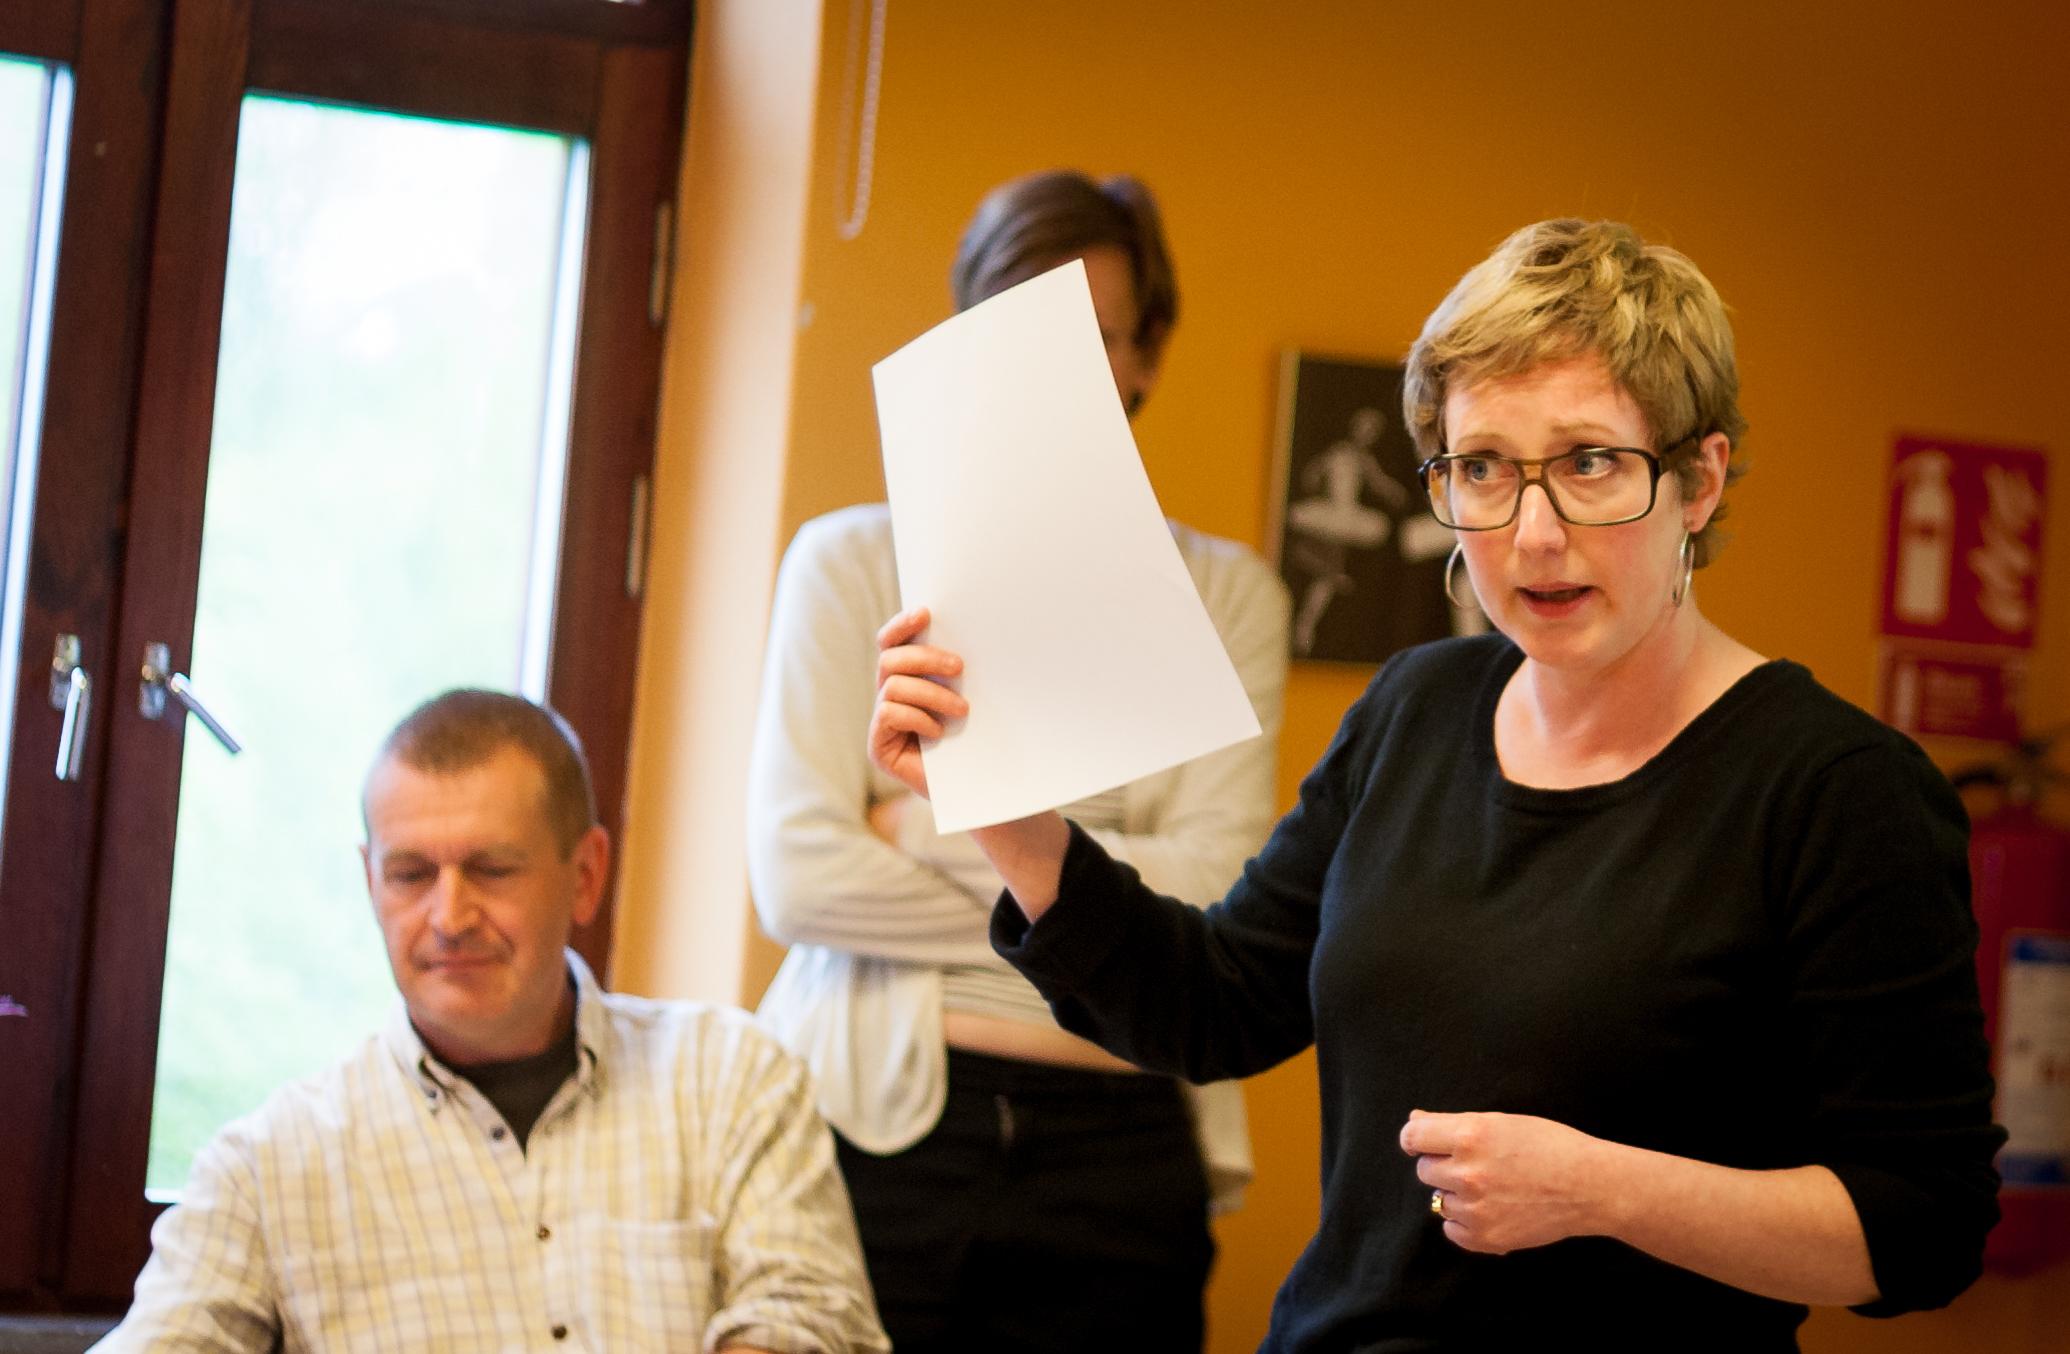 Hanna Gedin, deputy mayor in Malmö för the Left Party